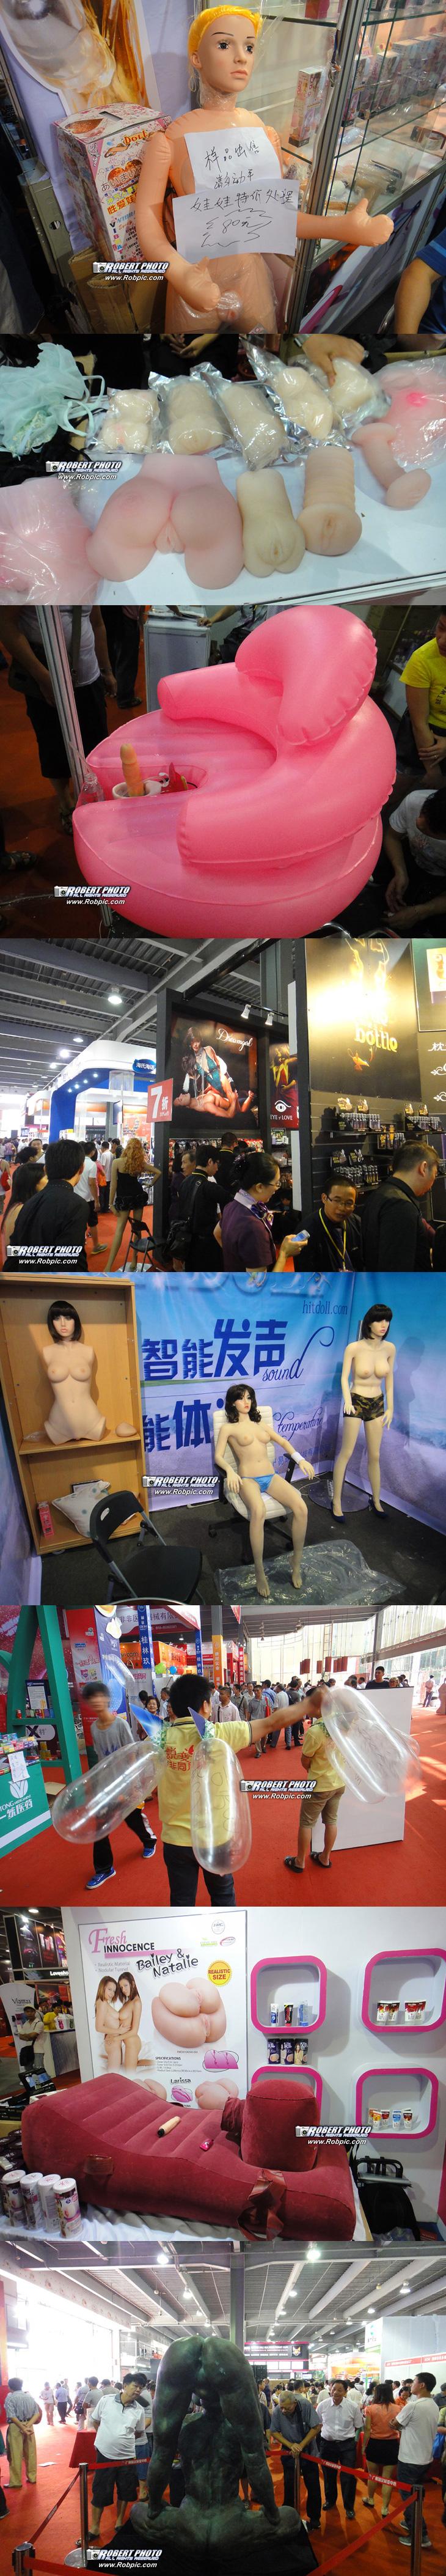 2012 广州性文化节  www.robpic.com